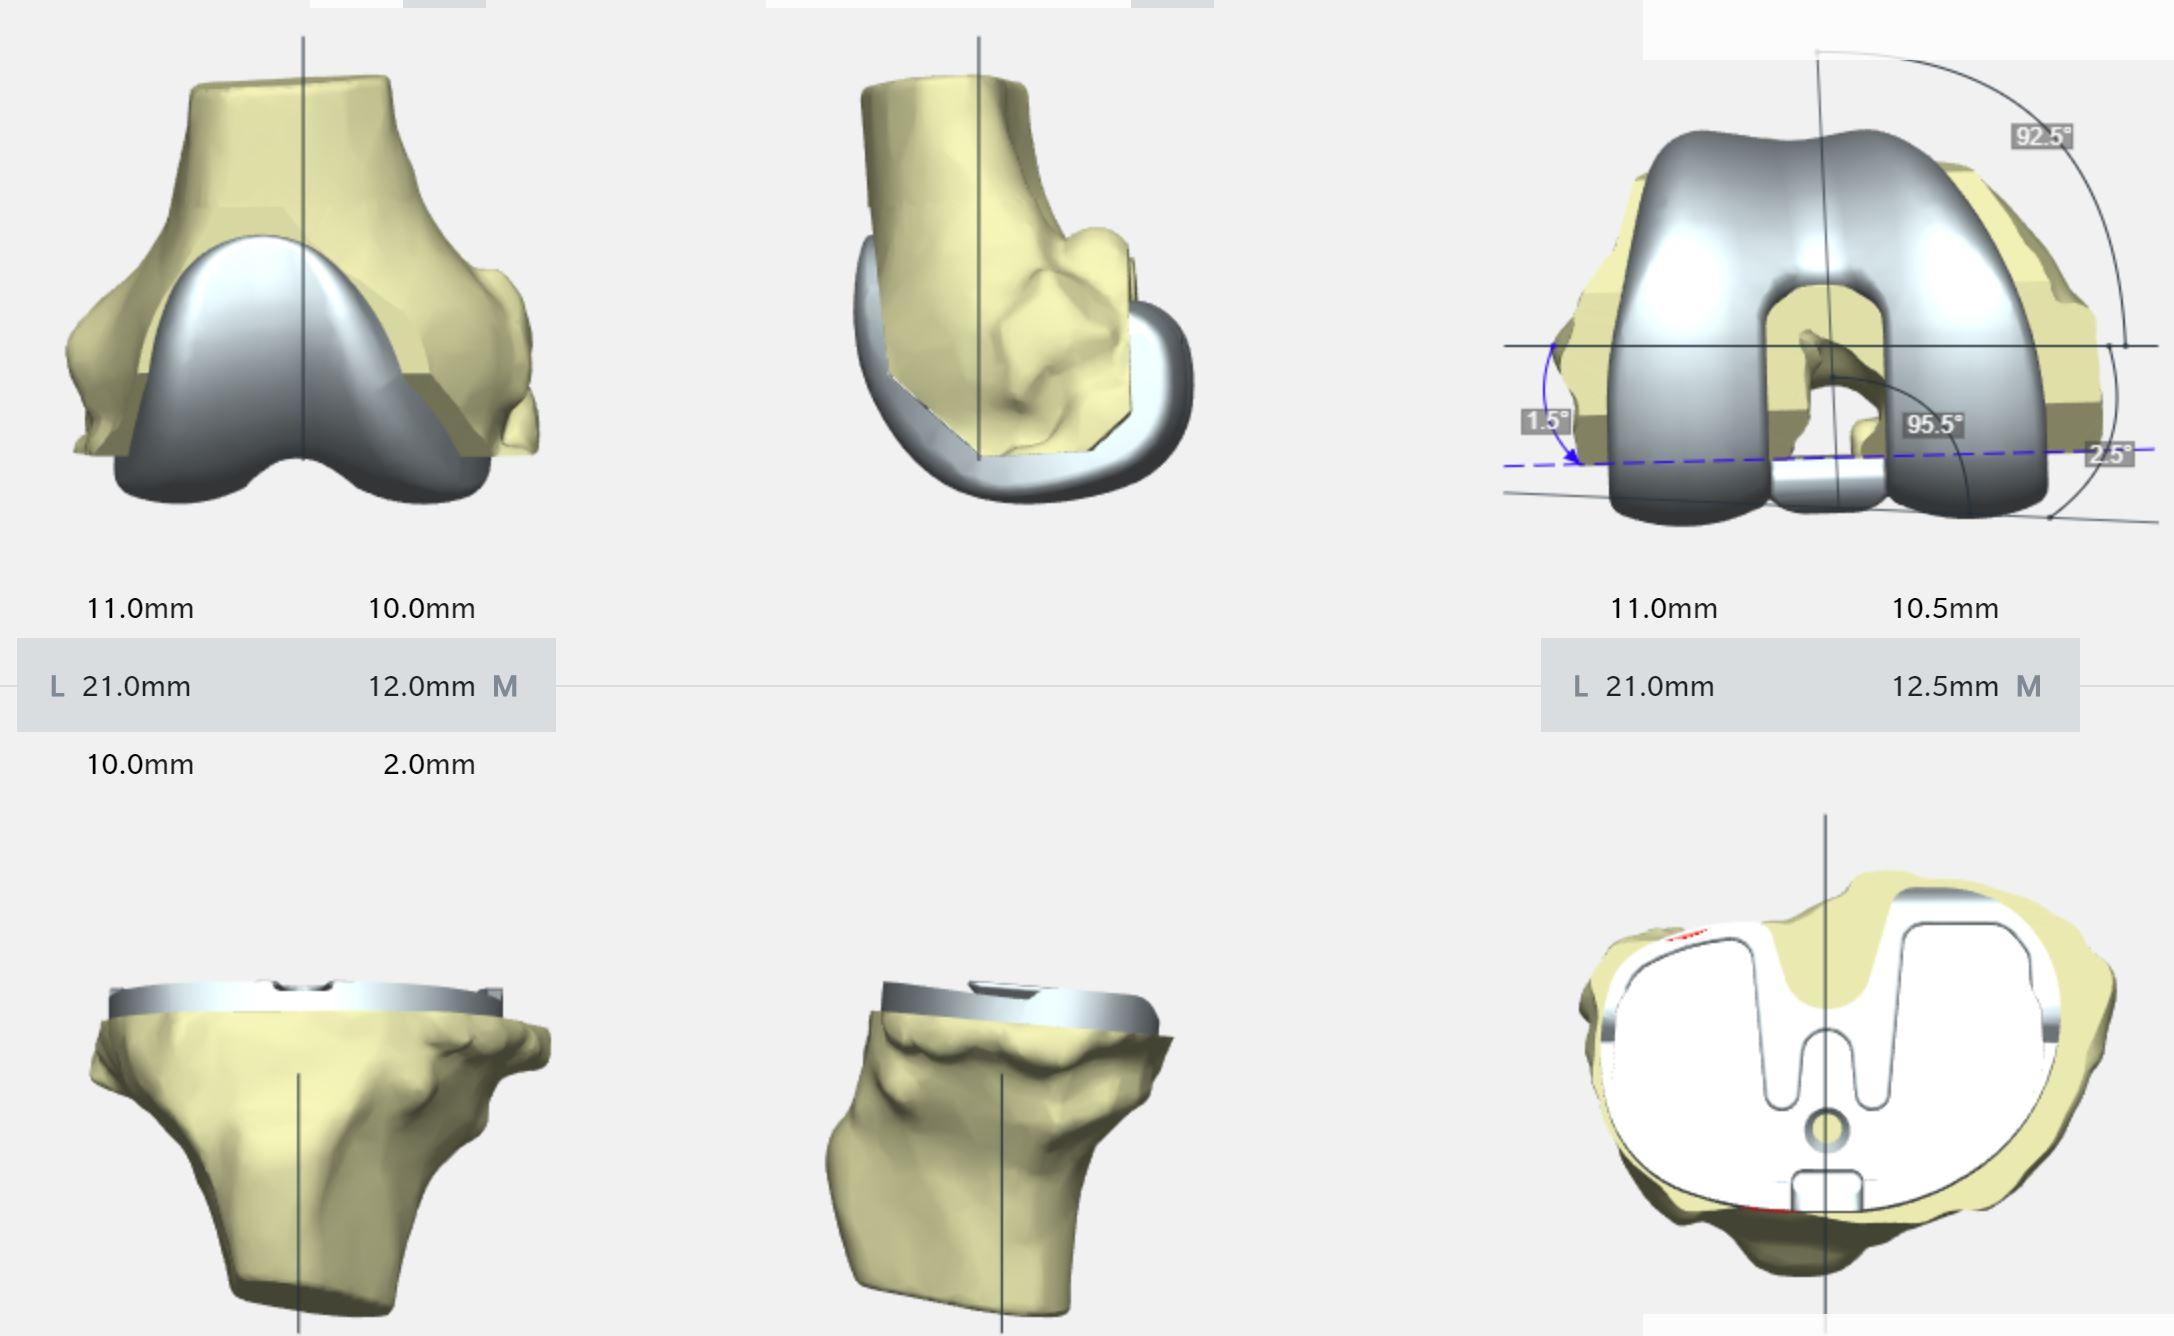 My Knee PSI Knieprothese Salzburg Dr. Planitzer Orthopäde